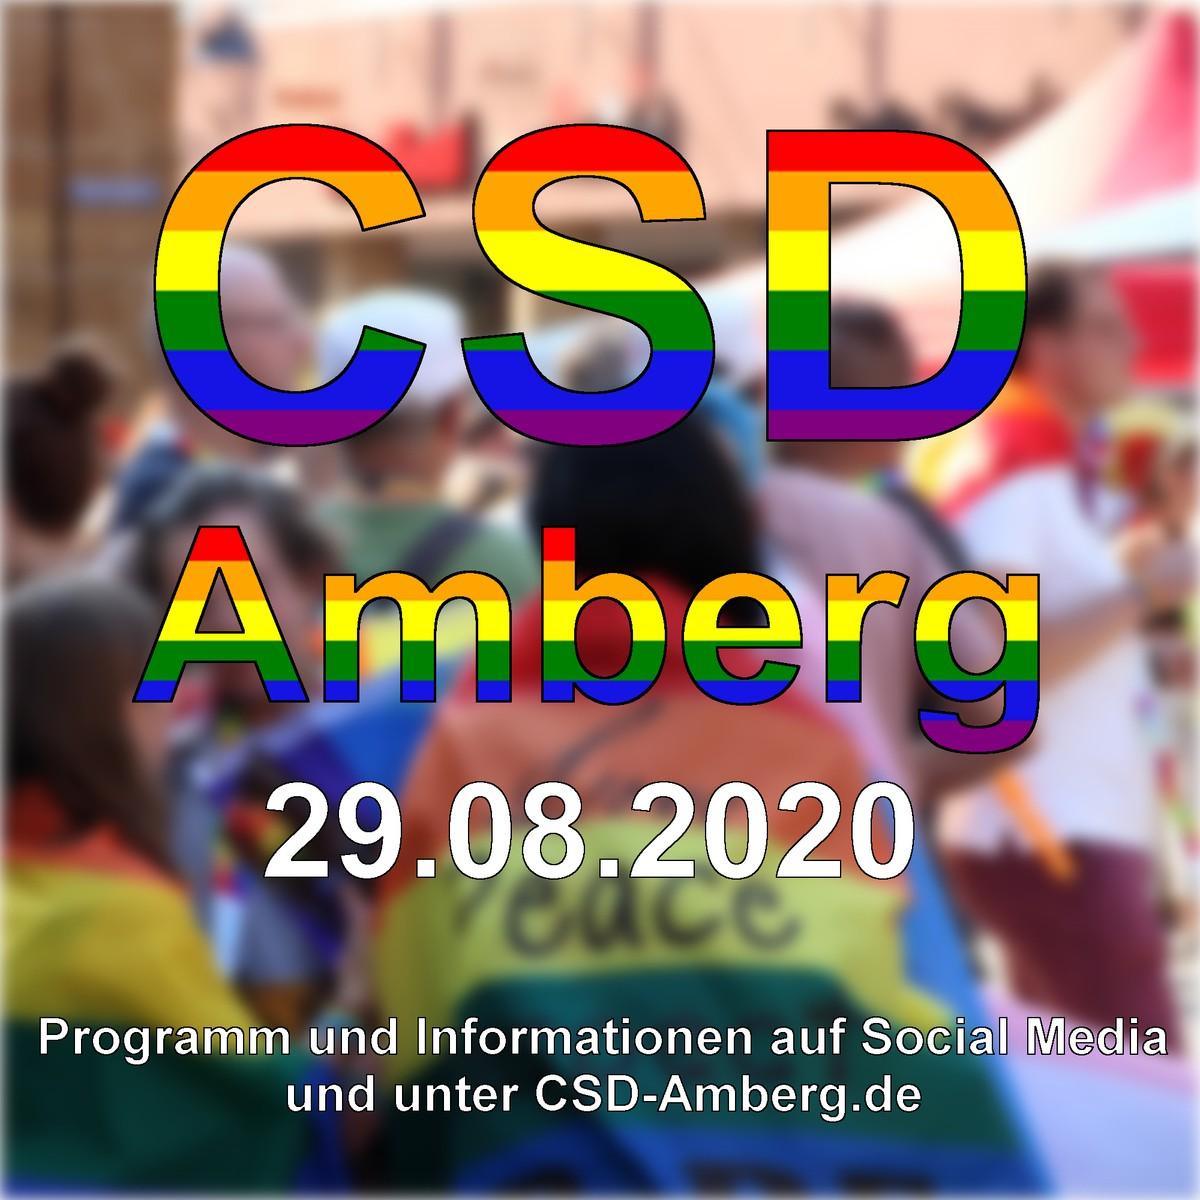 © Foto: Kunterbunt Amberg – Die Amberger Queere Jugendgruppe